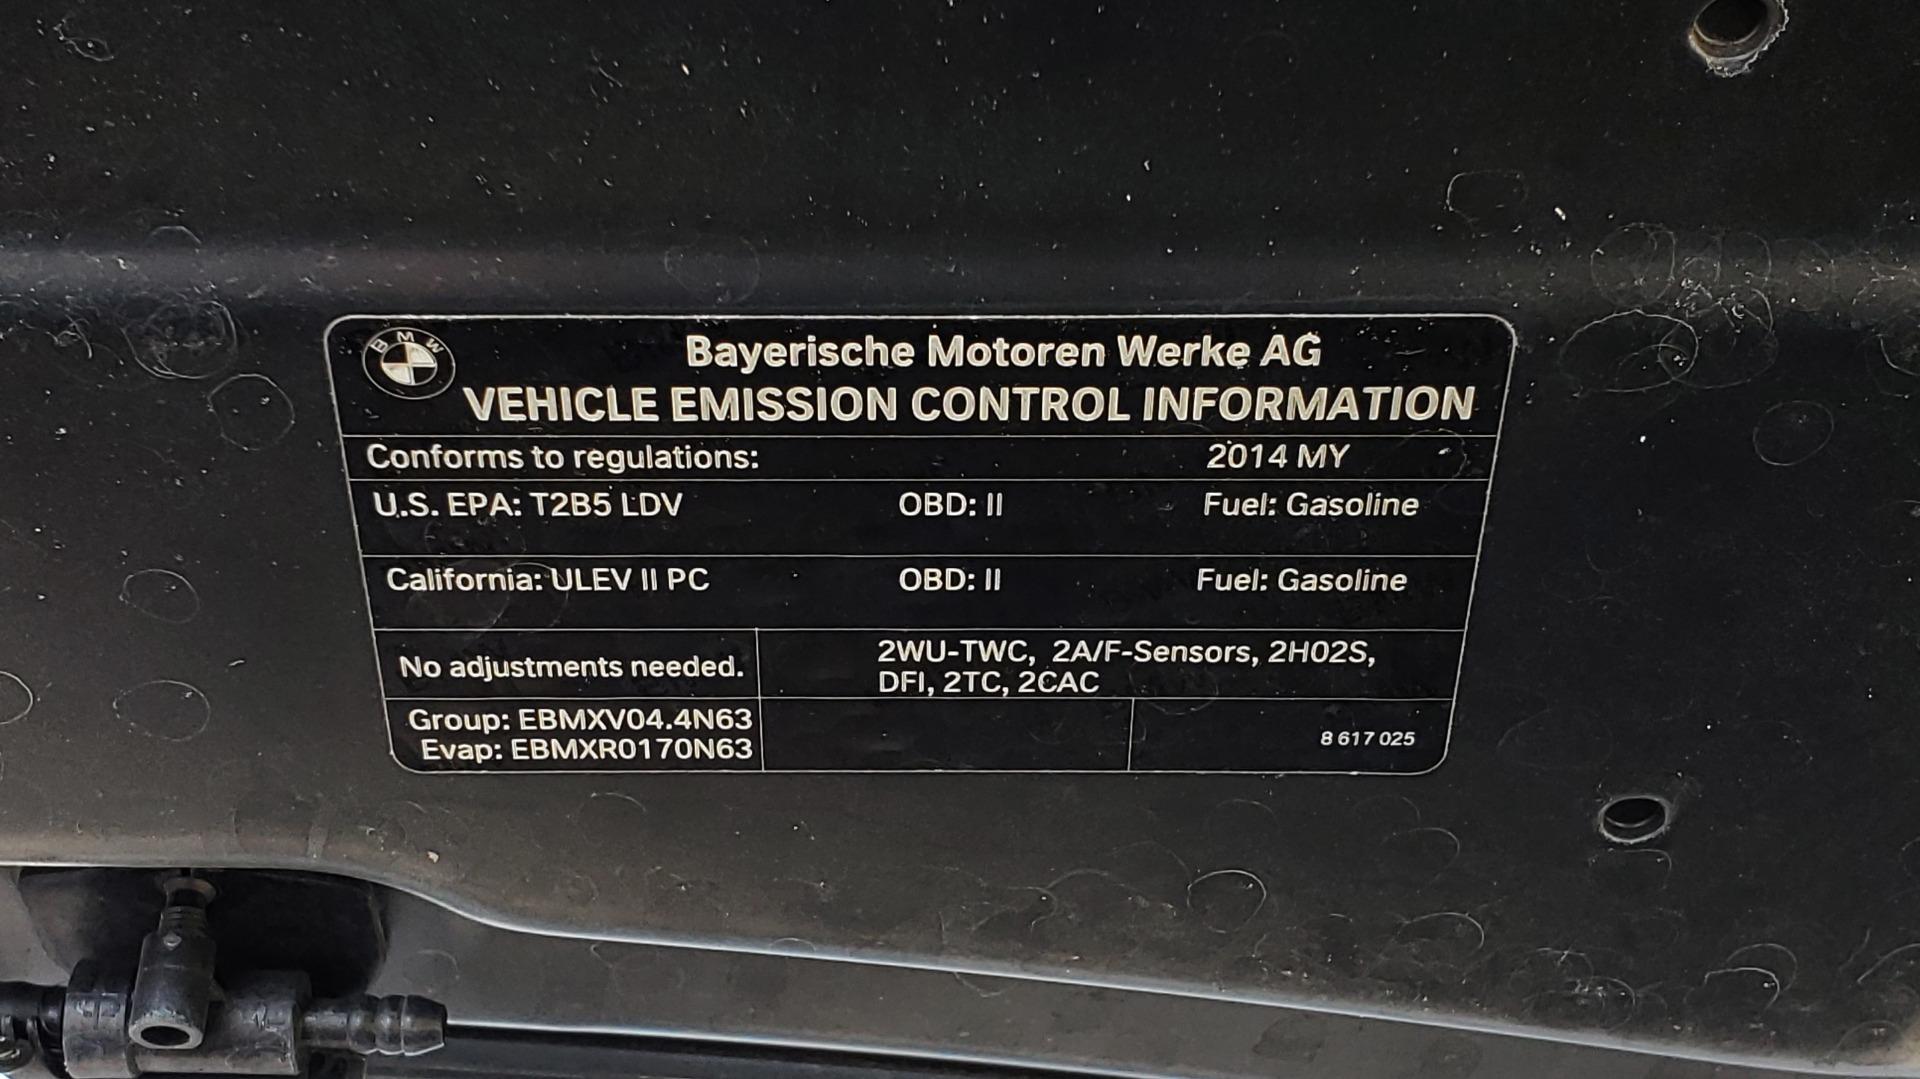 Used 2014 BMW 7 SERIES 750LI M-SPORT / EXEC PKG / DRVR ASST / LIGHTING / NAV / SUNROOF for sale Sold at Formula Imports in Charlotte NC 28227 12